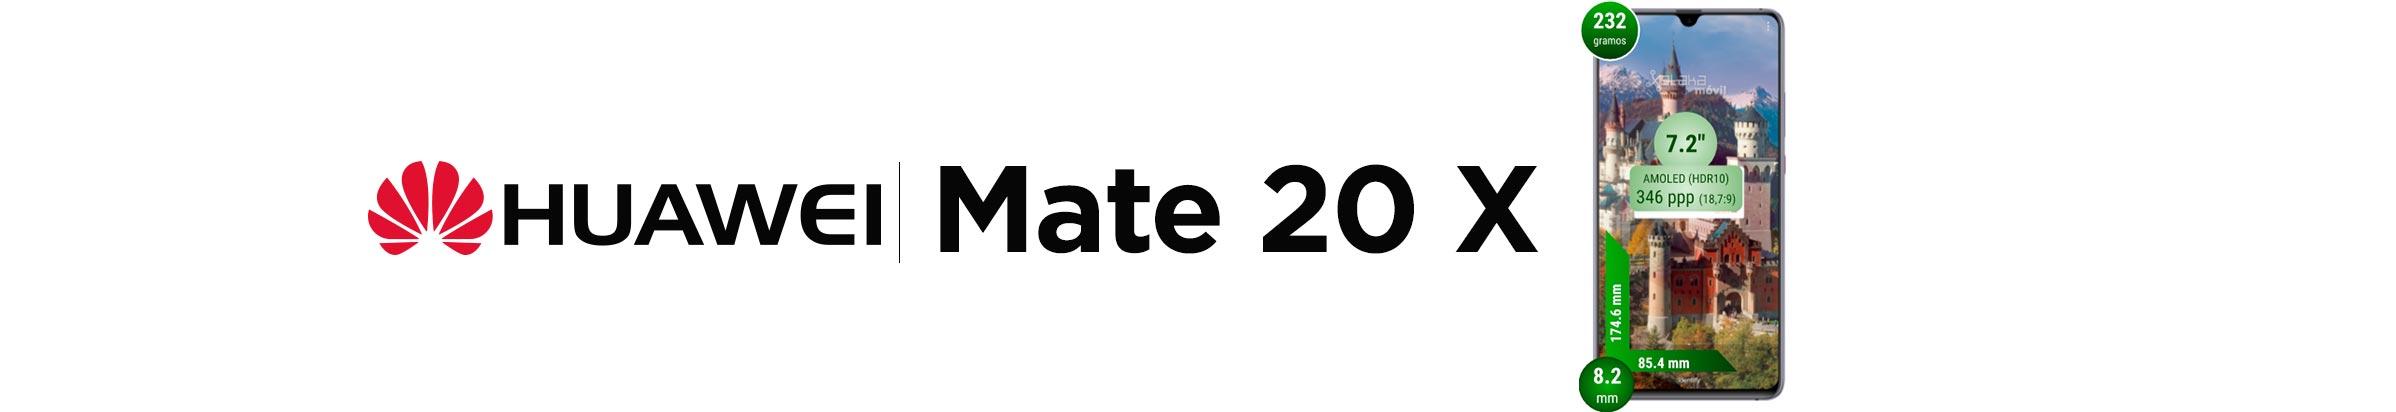 Blog-Img-Huawei-Mate20X